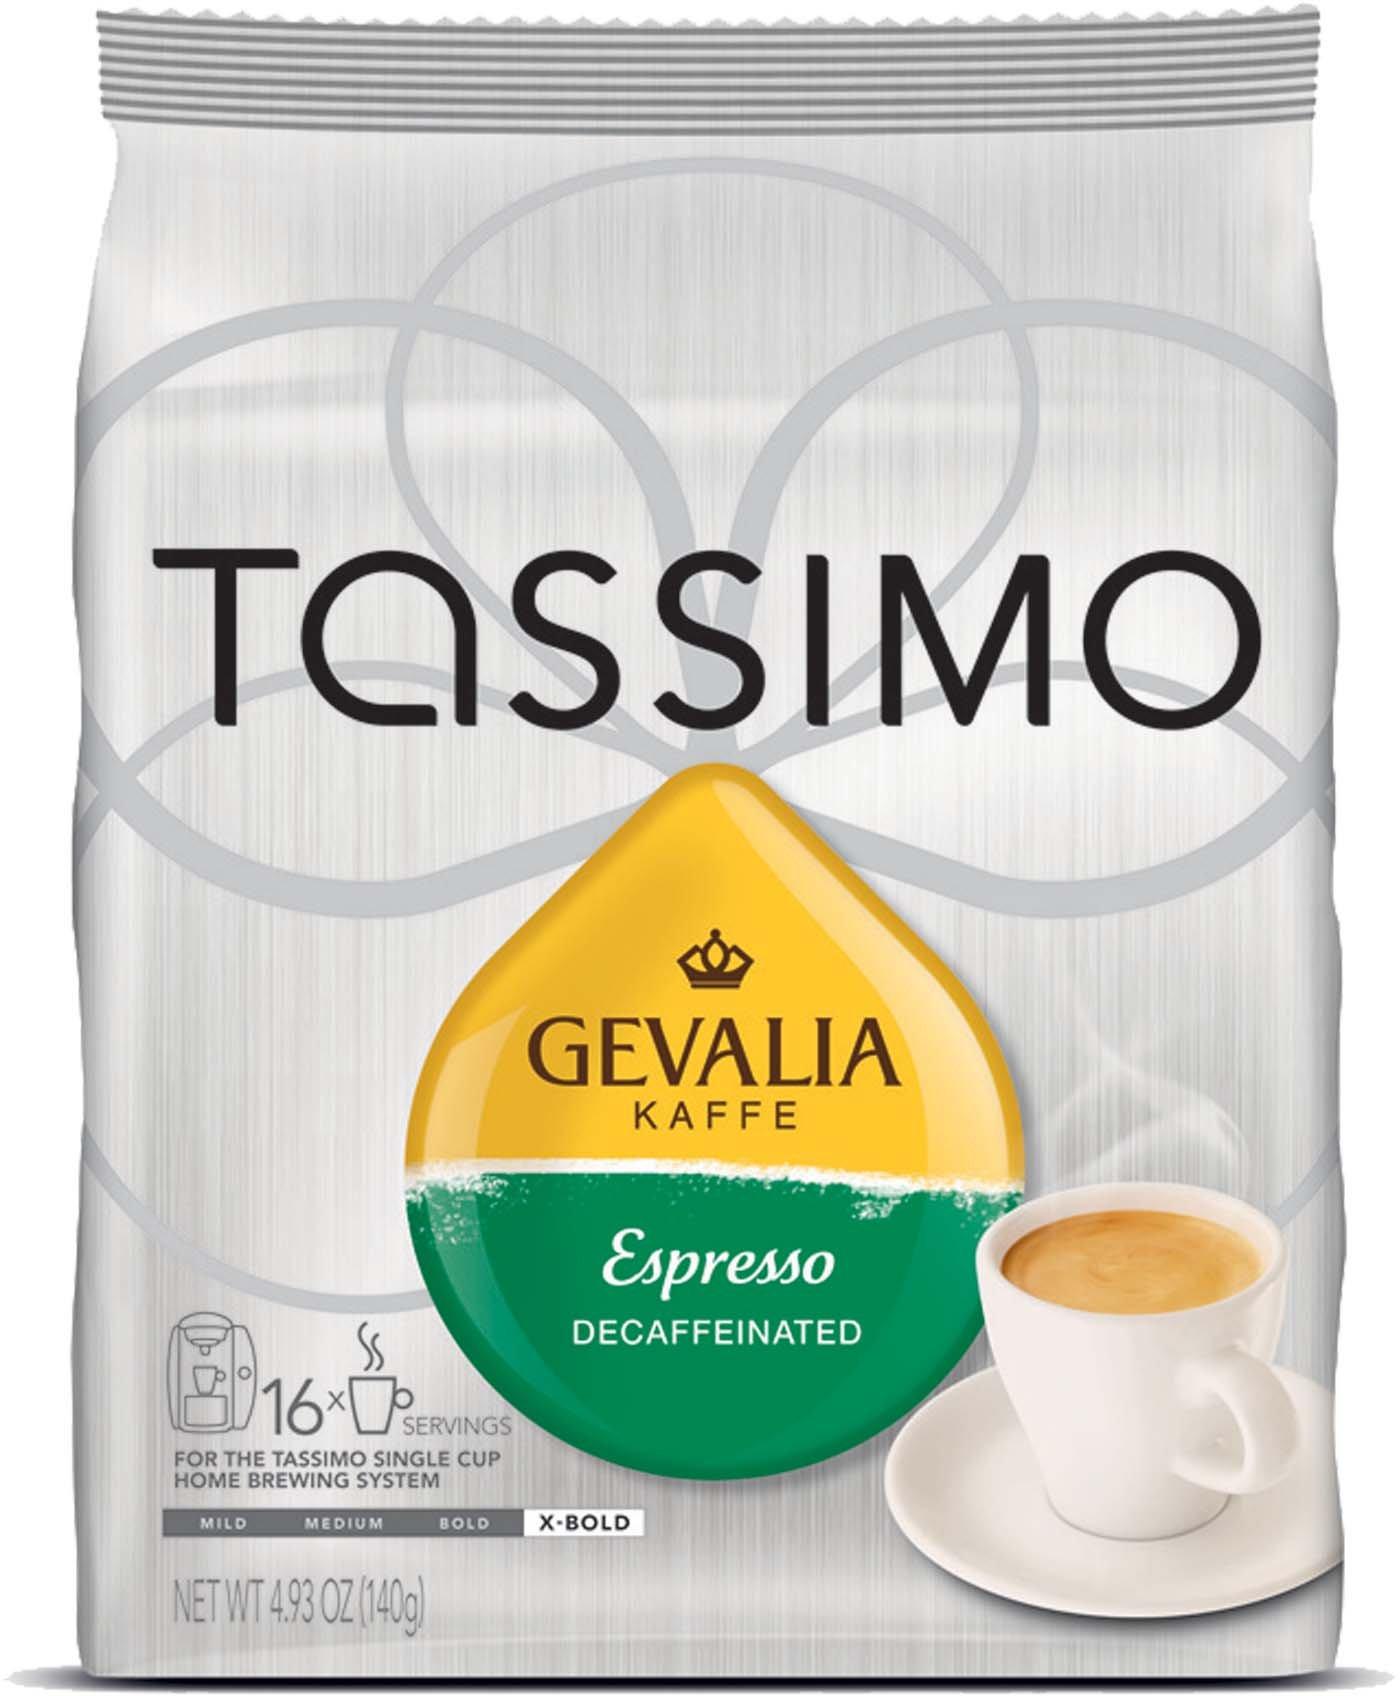 Gevalia Kaffe Decaffeinated Espresso (Pack Of 3) by Gevalia